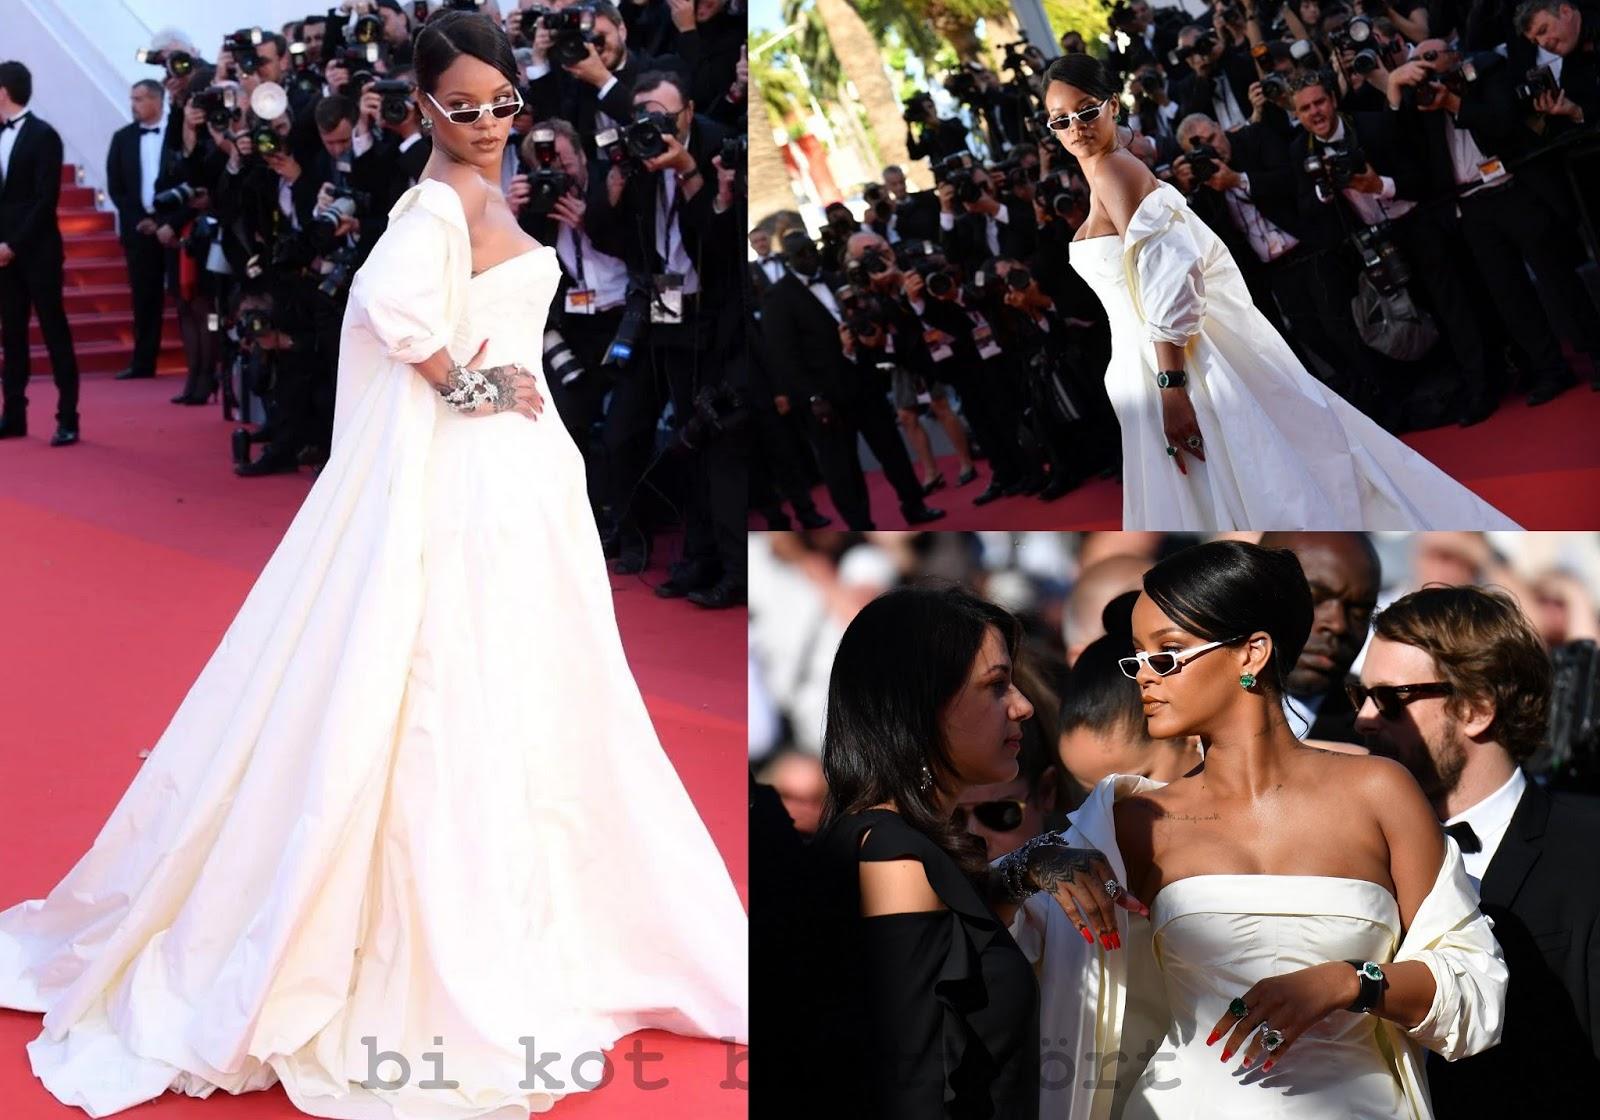 Cannes Film Festivali En İyi Saç ve Makyaj 2017